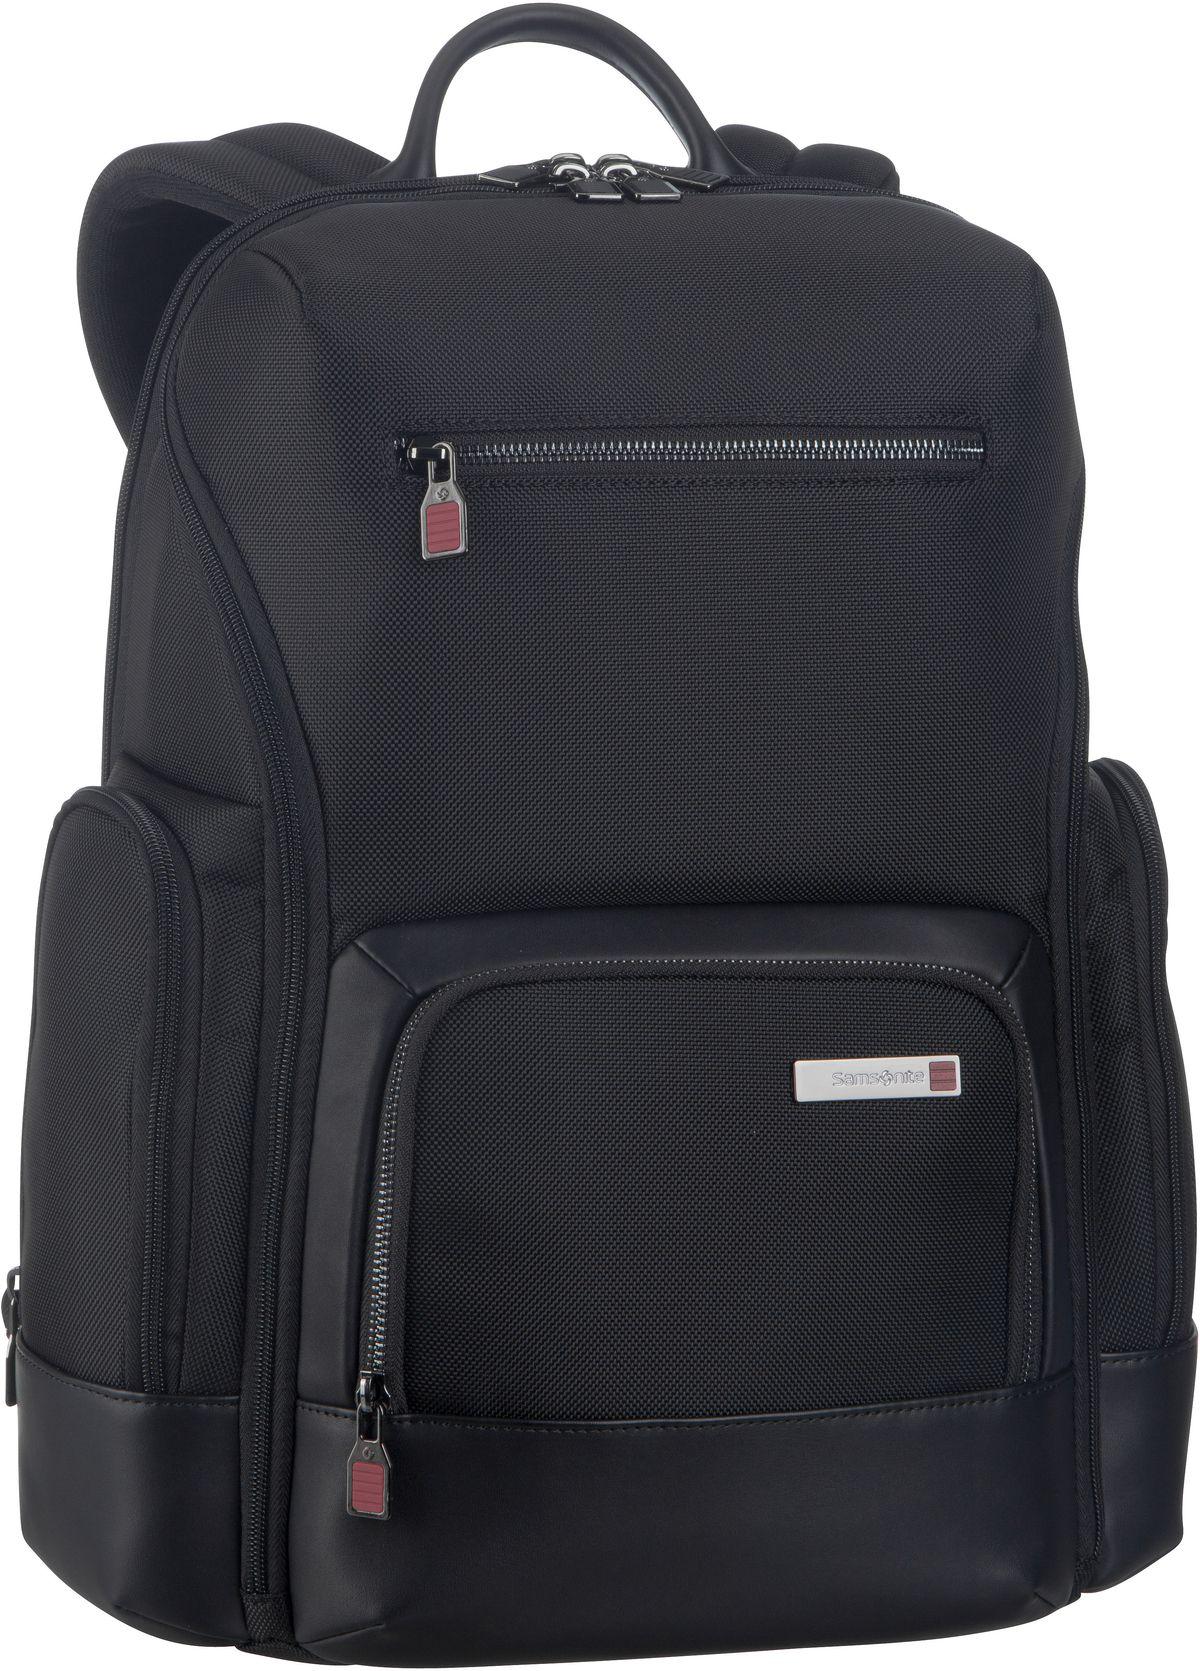 Rucksack / Daypack Safton LP Backpack 15.6'' Black (20 Liter)